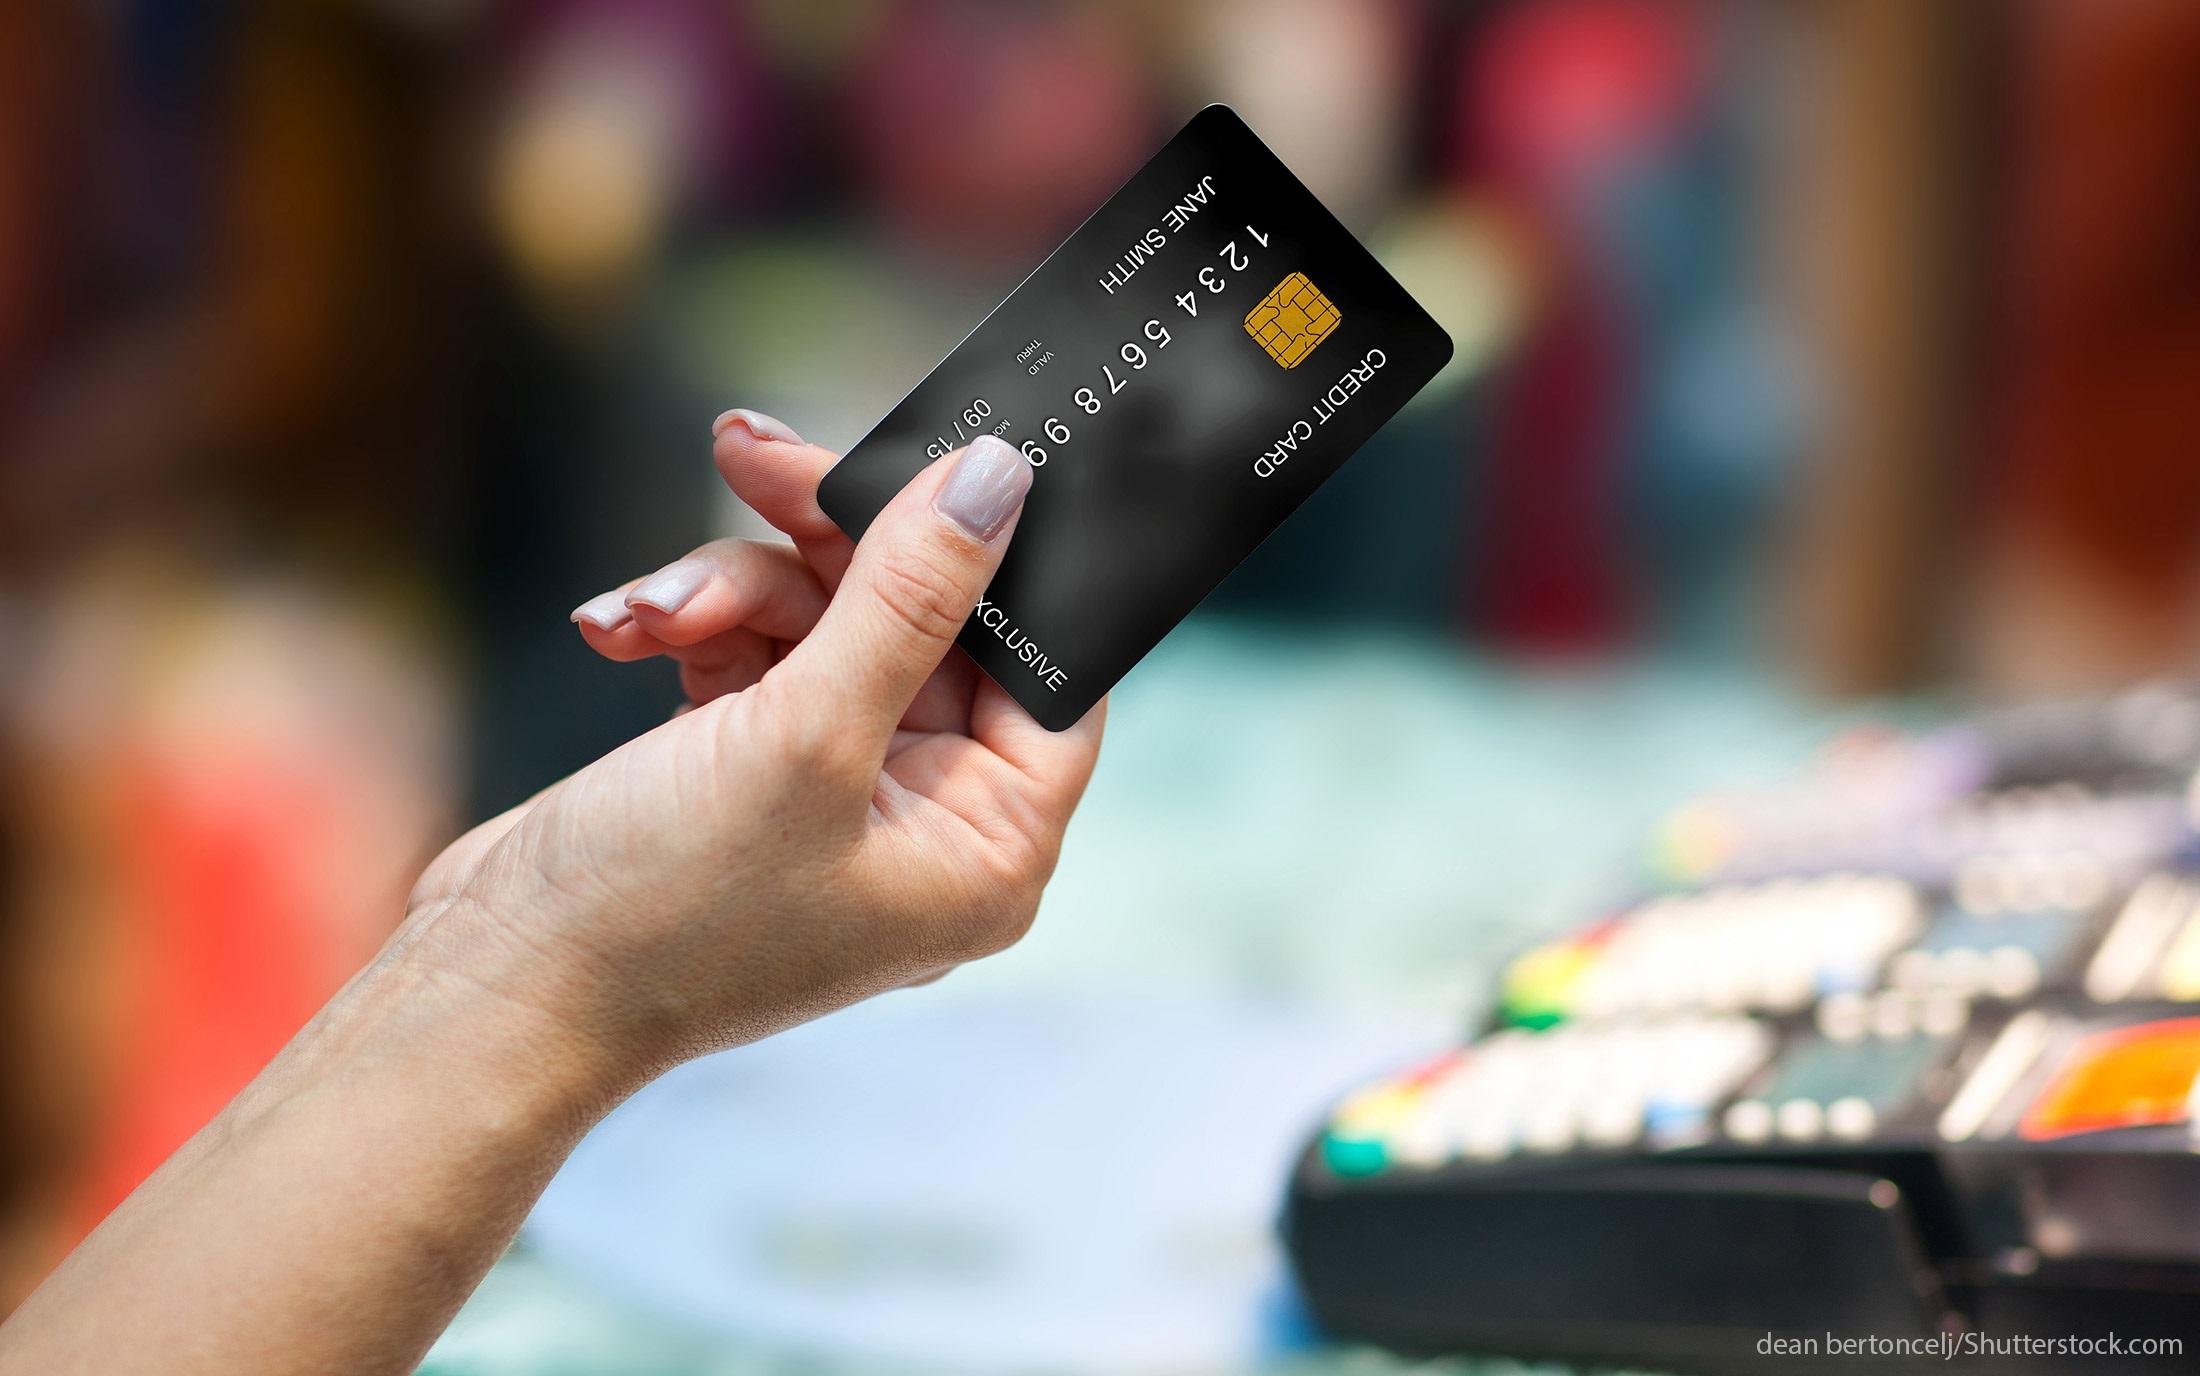 Provide a Minor With a Debit Card